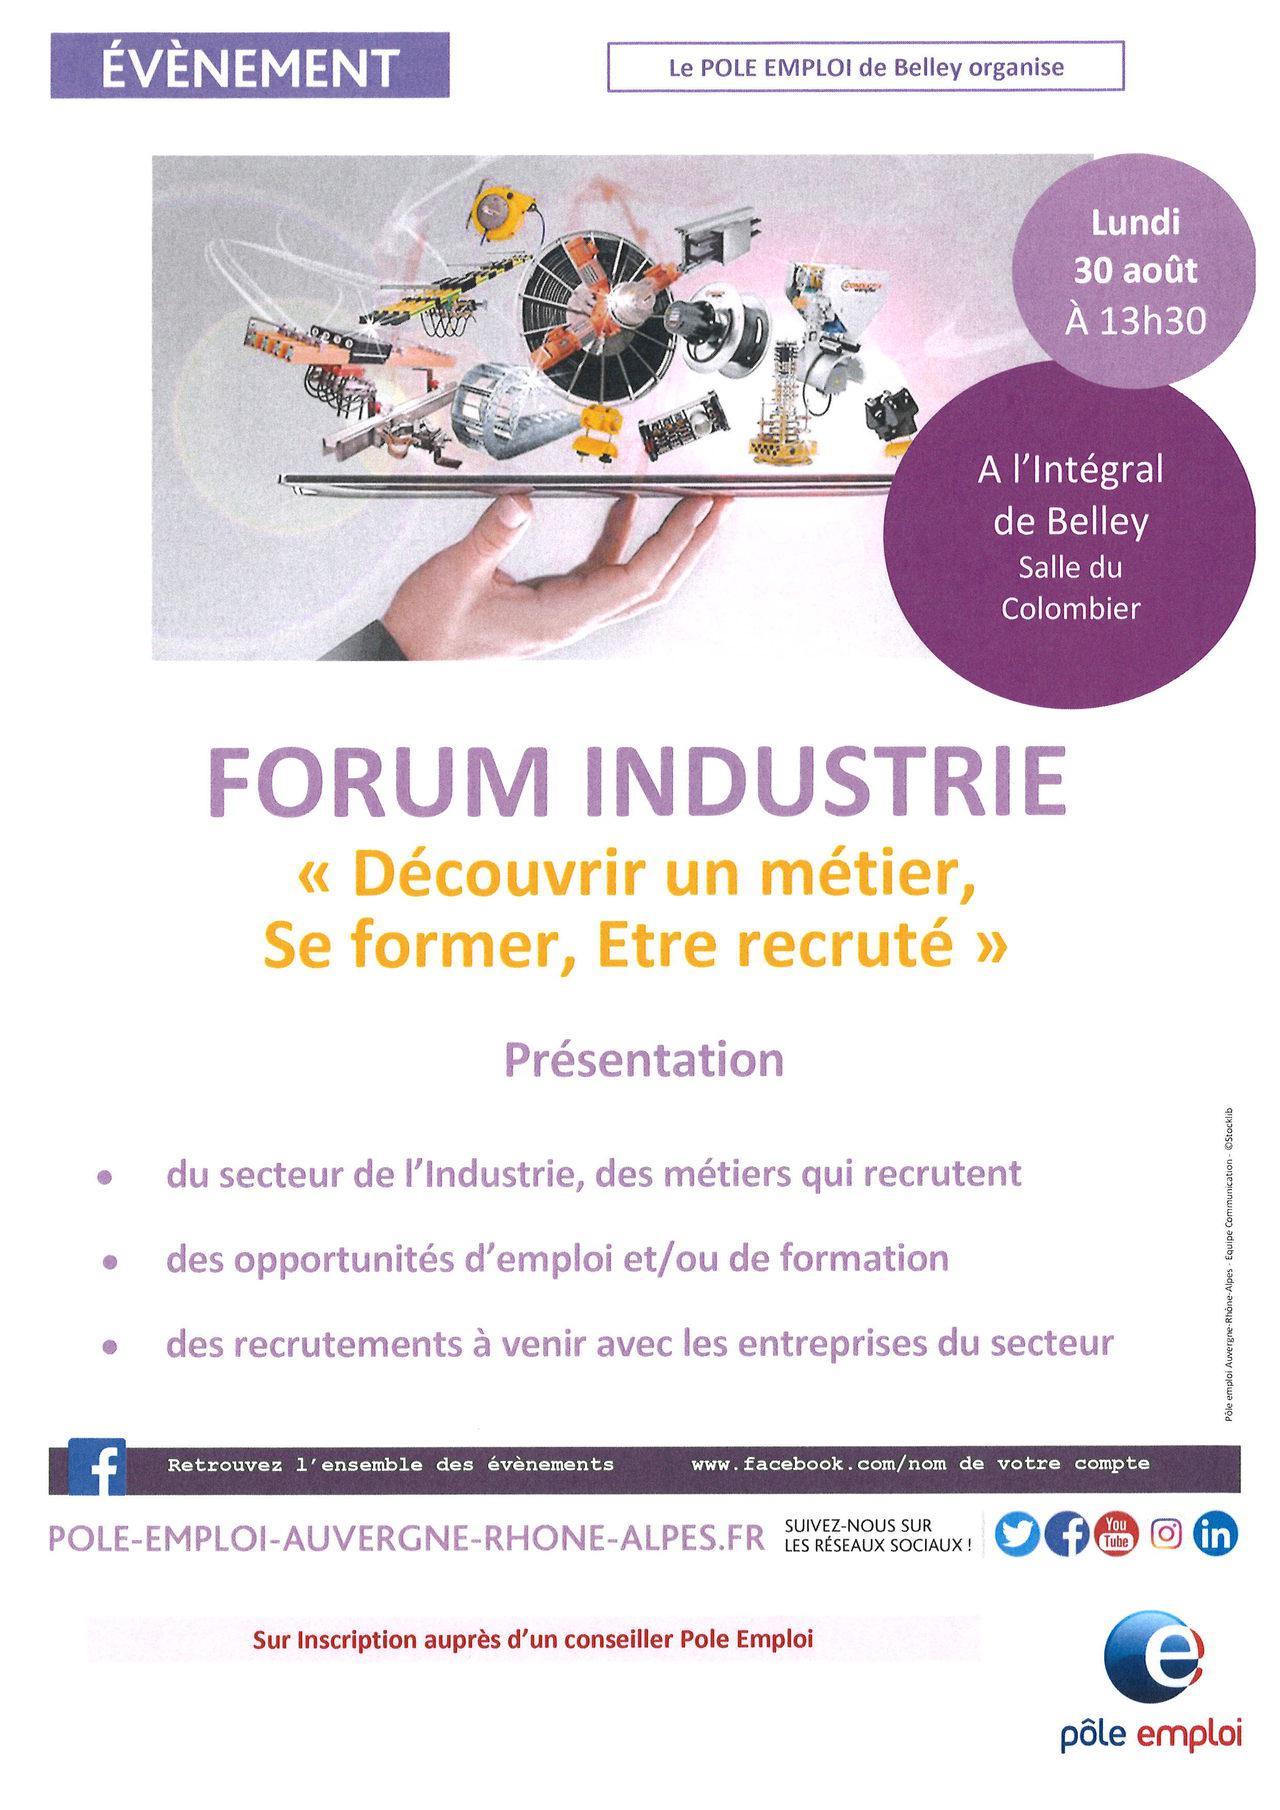 FORUM Industrie Belley